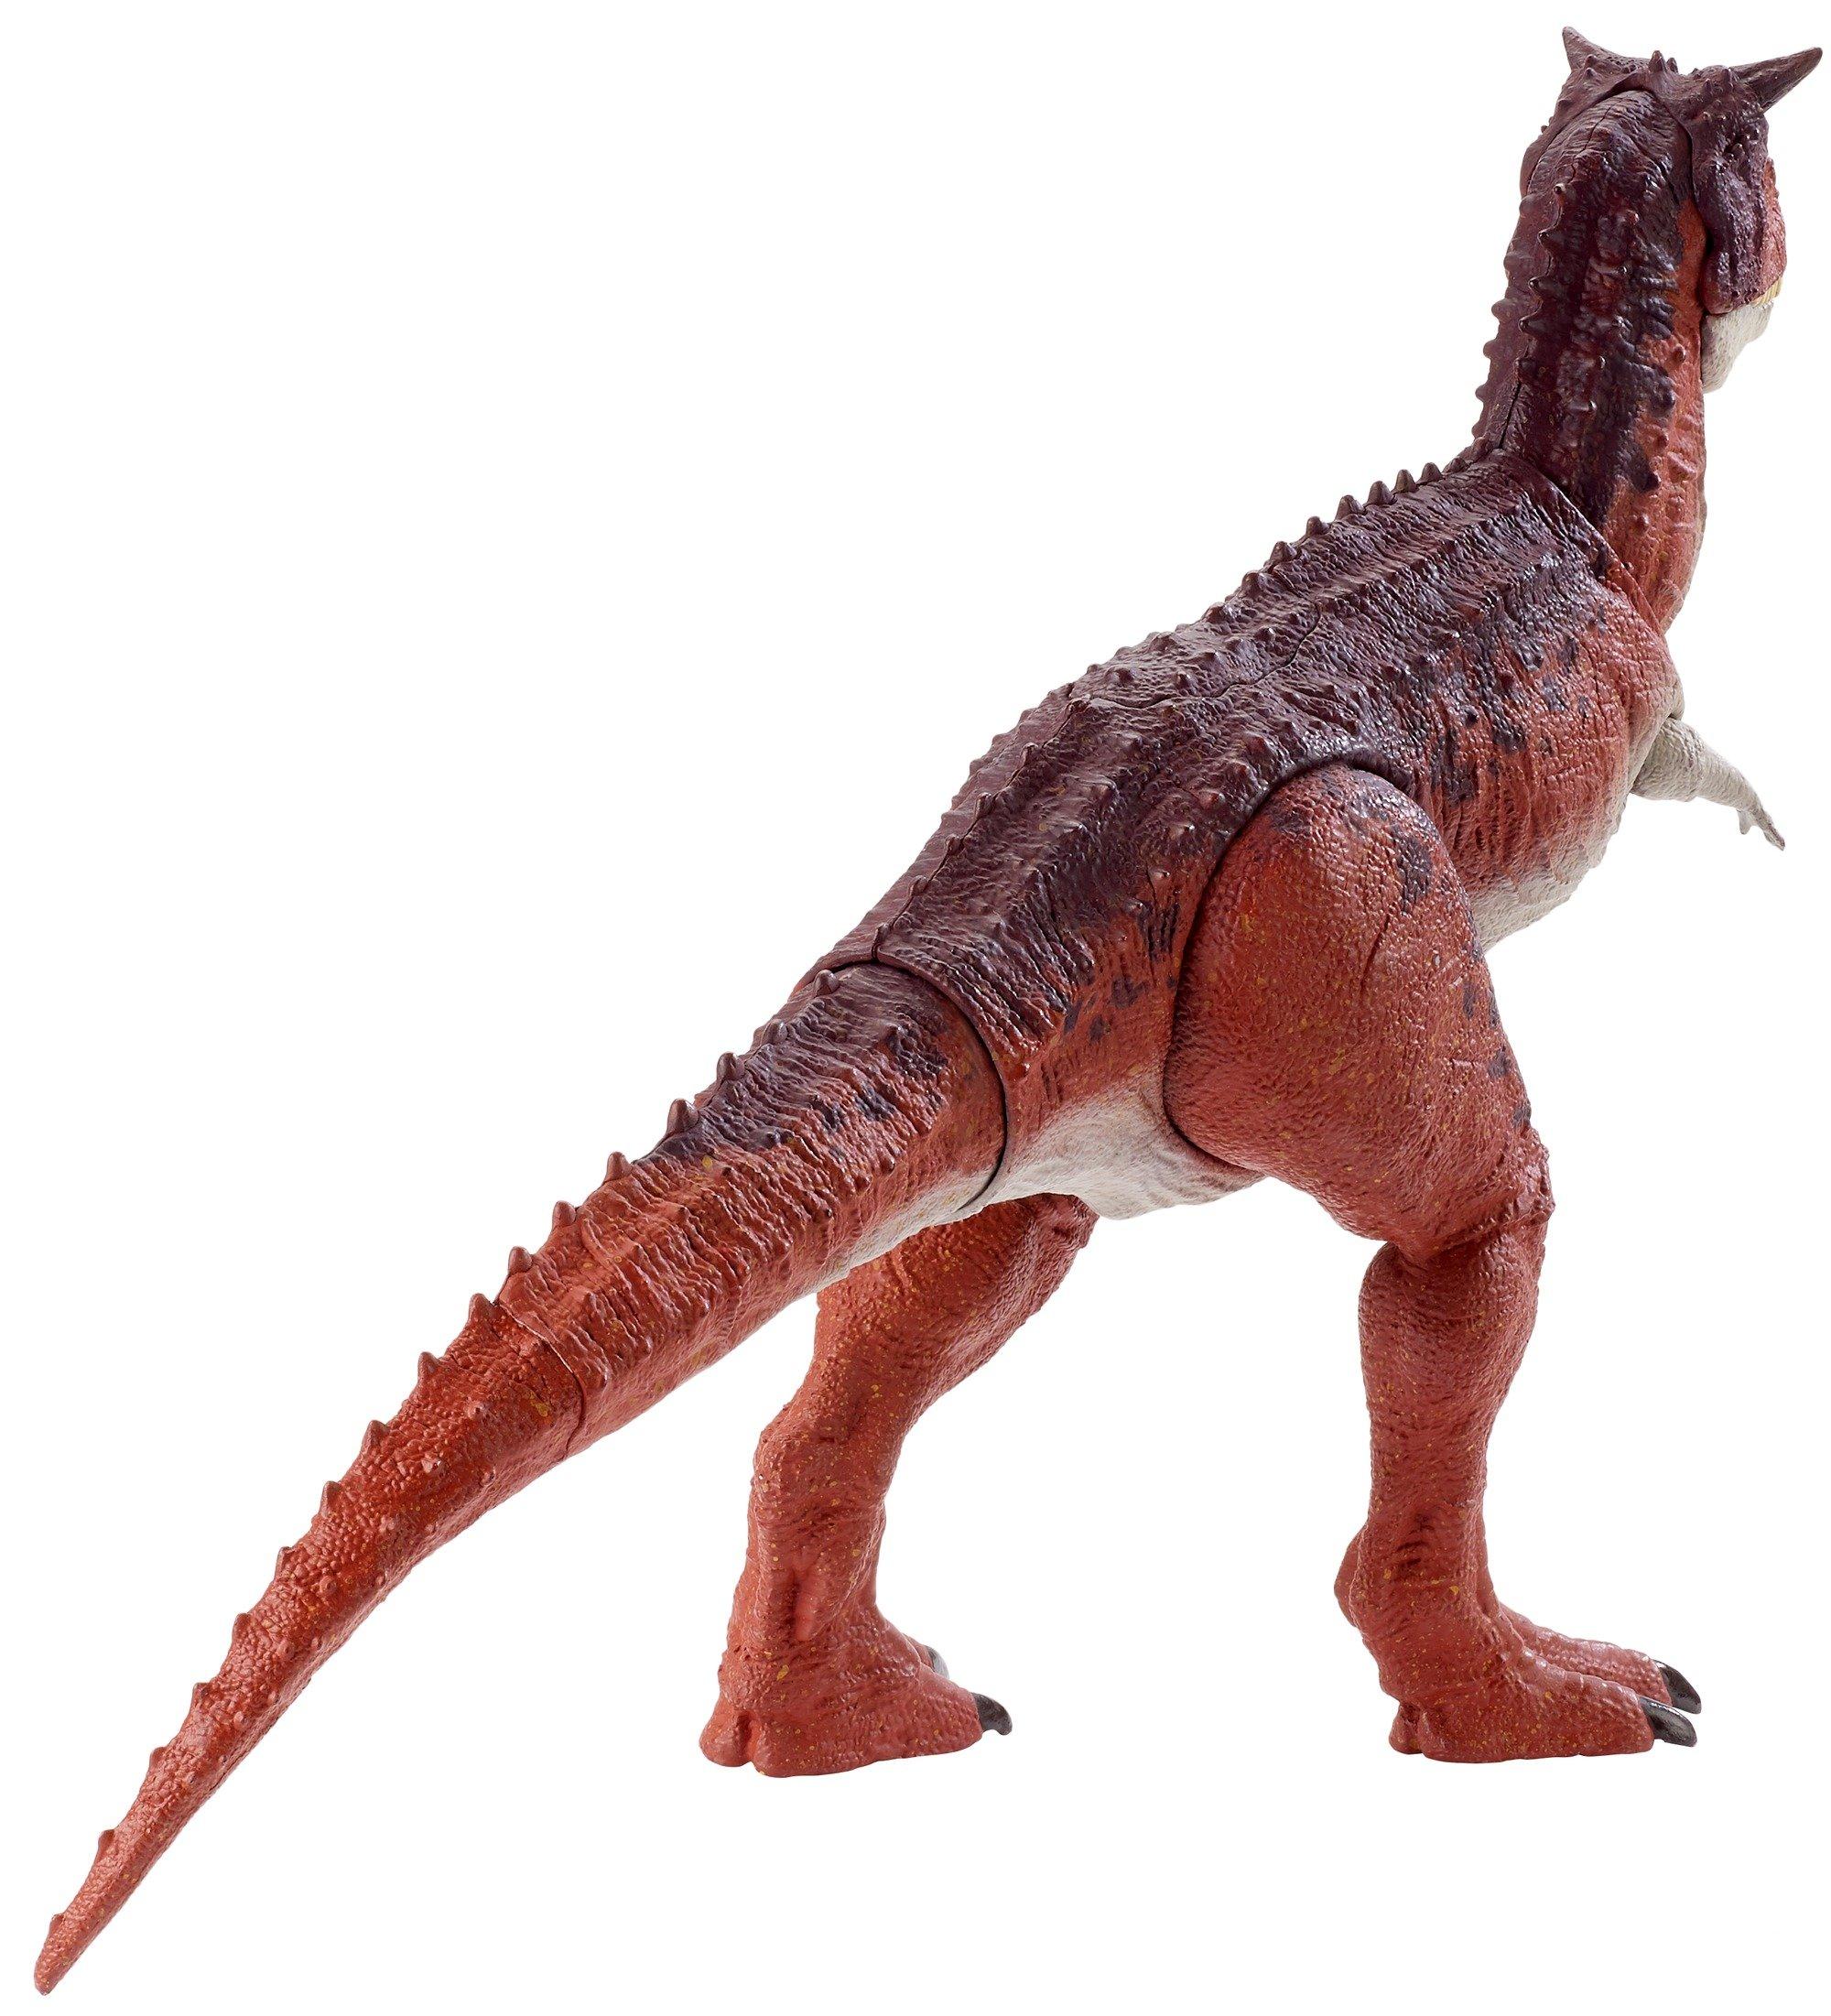 Jurassic World Action Attack Carnotaurus Figure by Jurassic World Toys (Image #3)